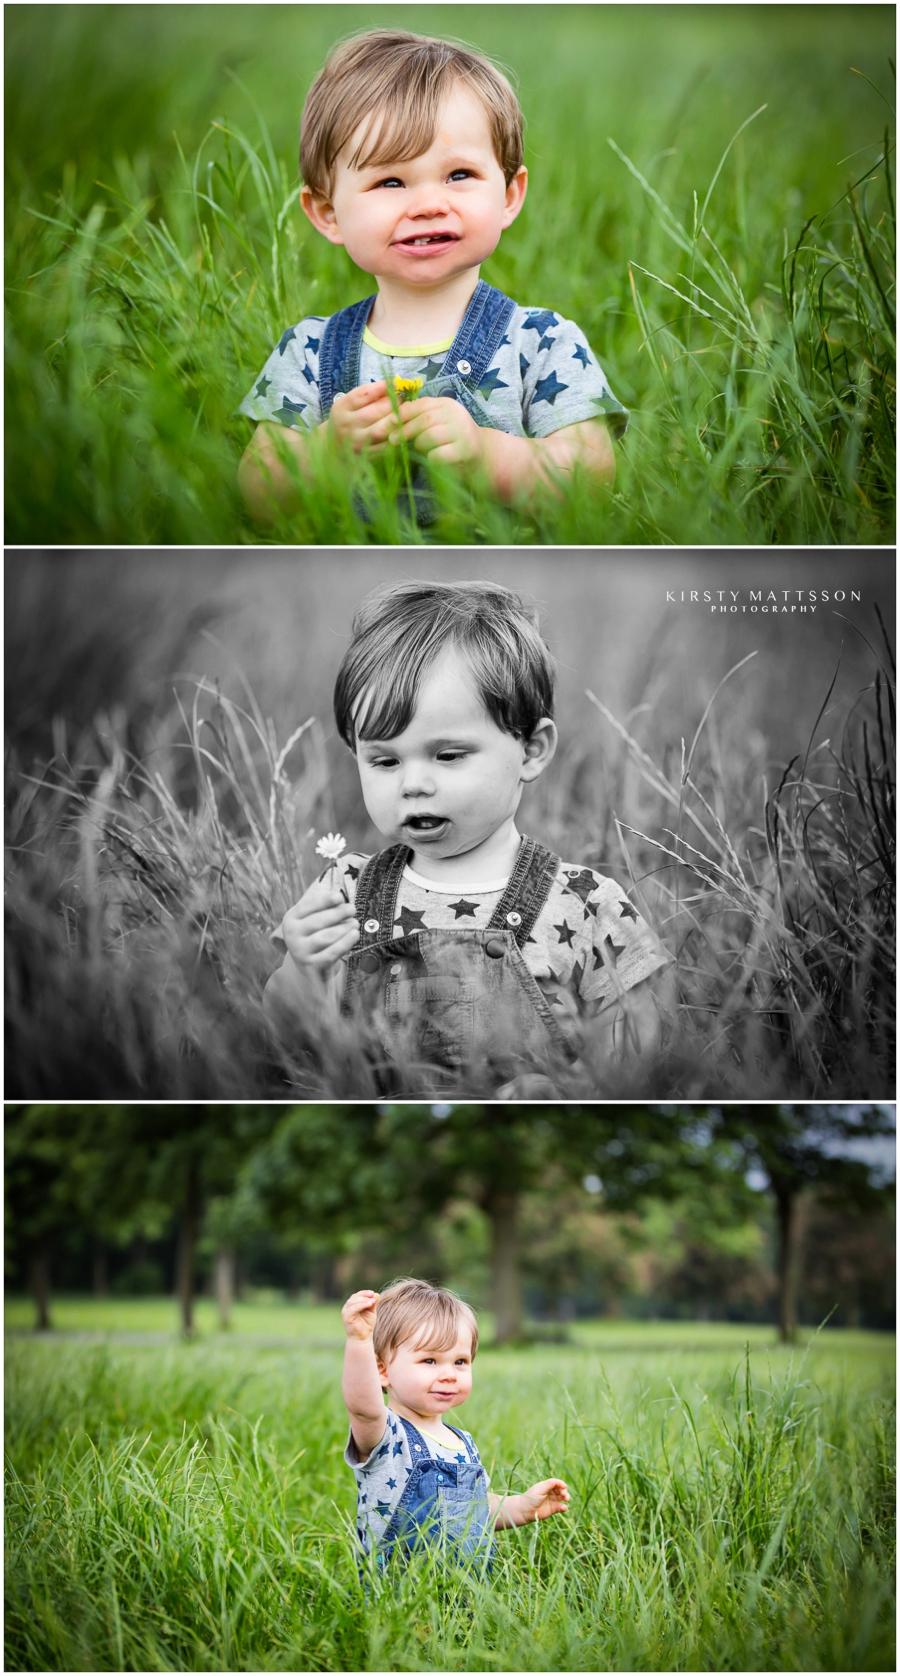 KM-family-portrait-photography-19